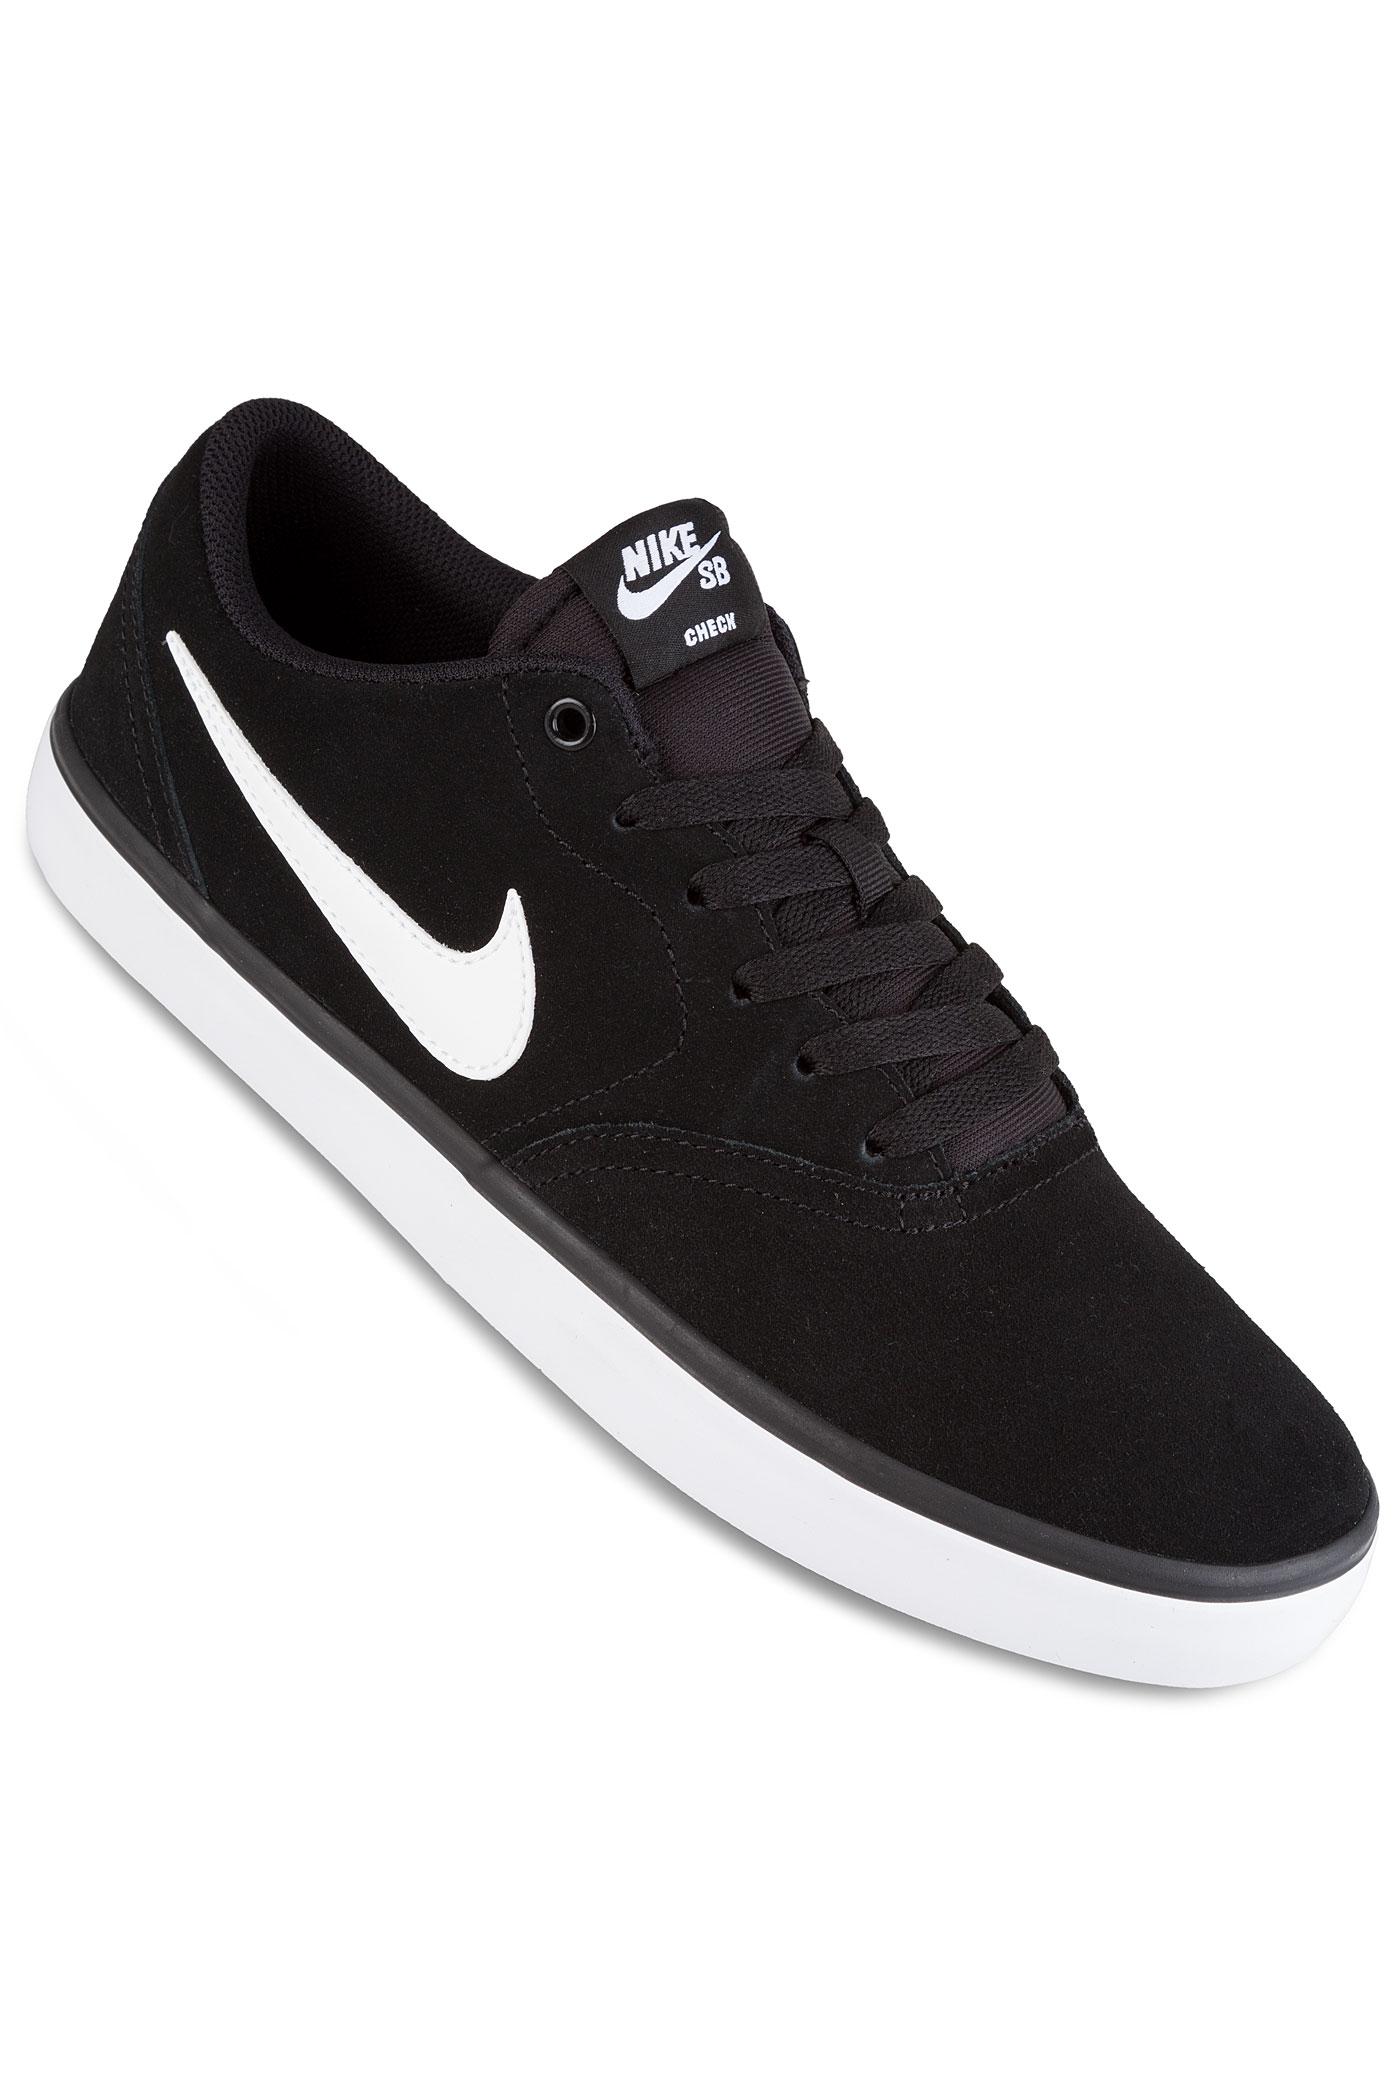 nike sb check solarsoft shoes black white buy at skatedeluxe. Black Bedroom Furniture Sets. Home Design Ideas